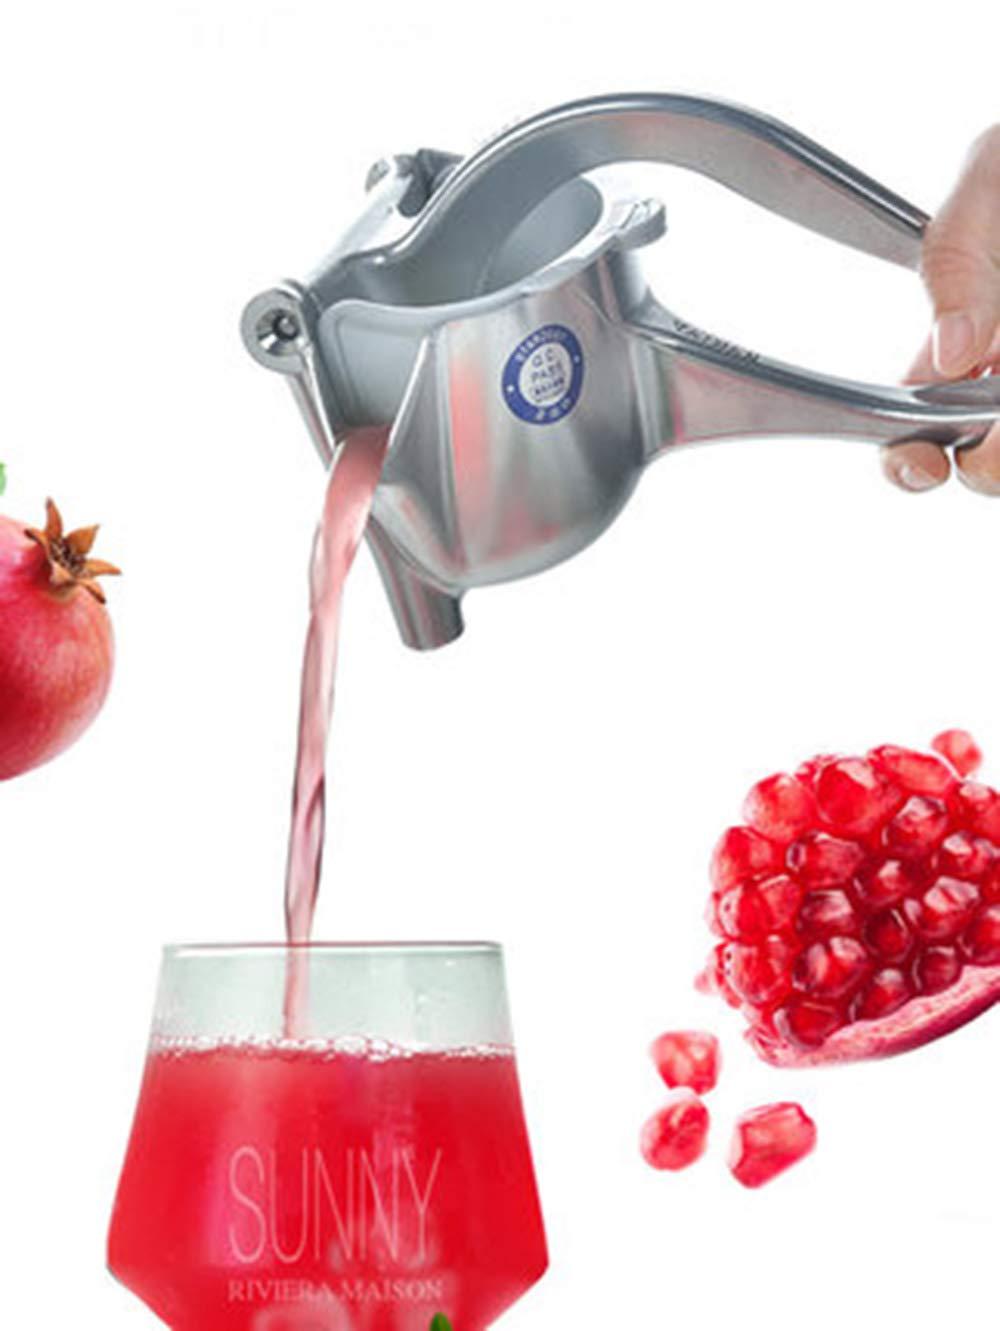 GOOG Manual pomegranate juicer machine sugarcane juicer machine